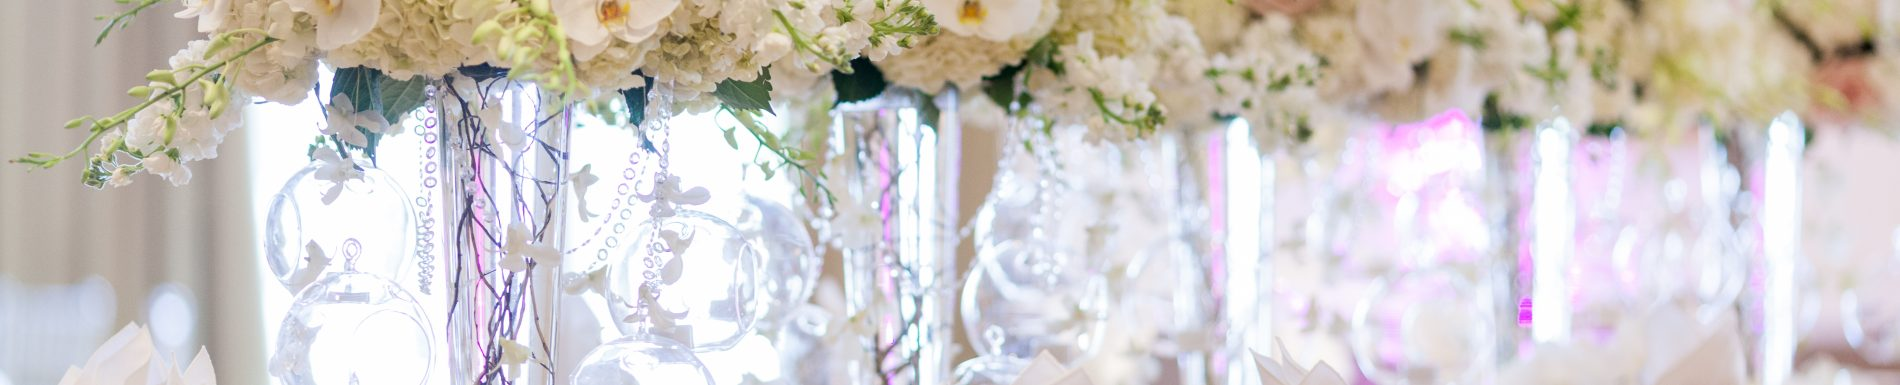 wedding-florist-winston-salem